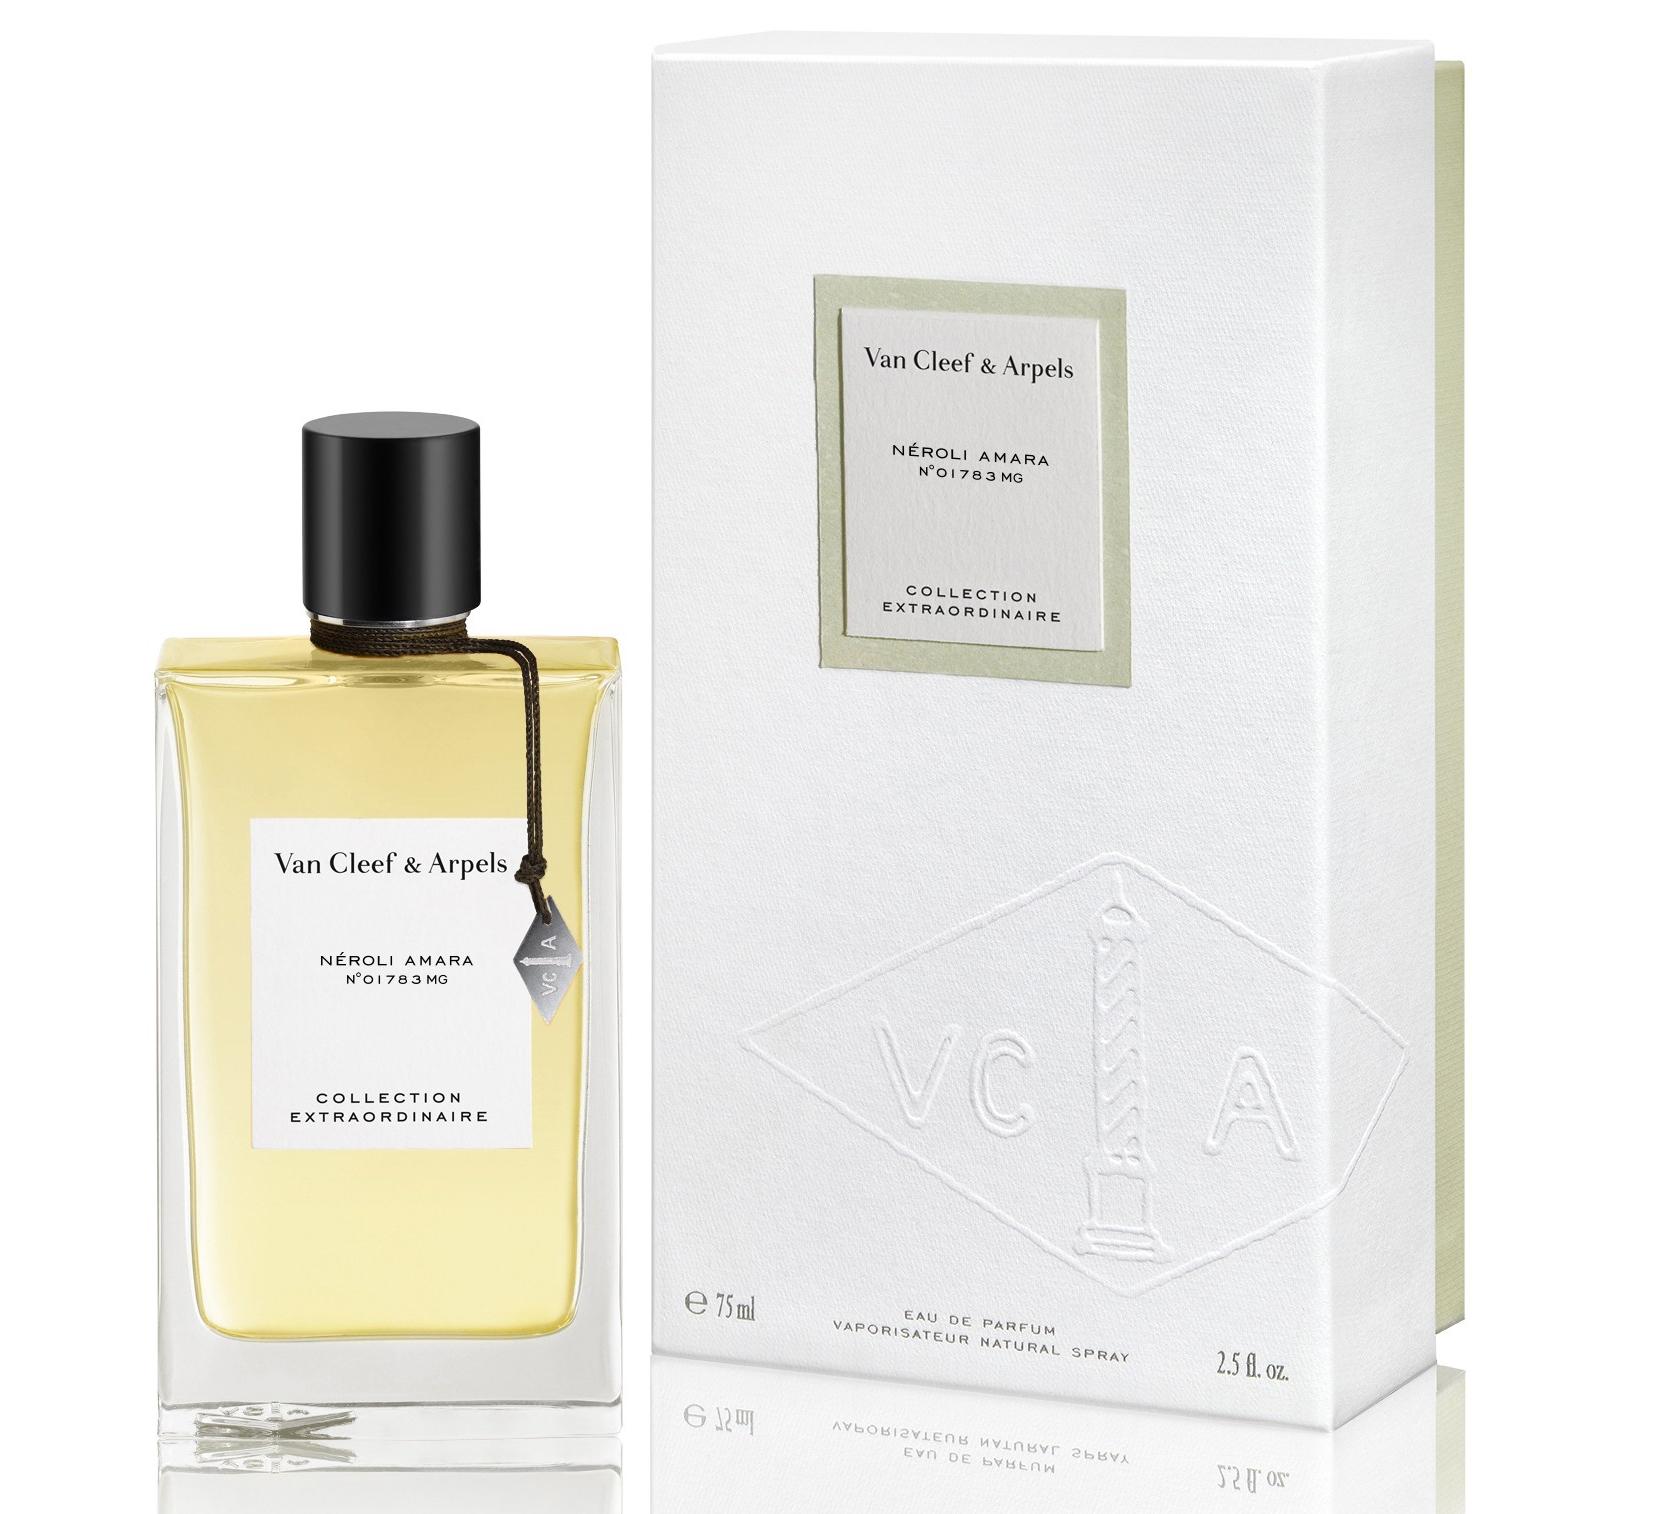 Van Cleef & Arpels Collection Extraordinaire Neroli Amara Flacon